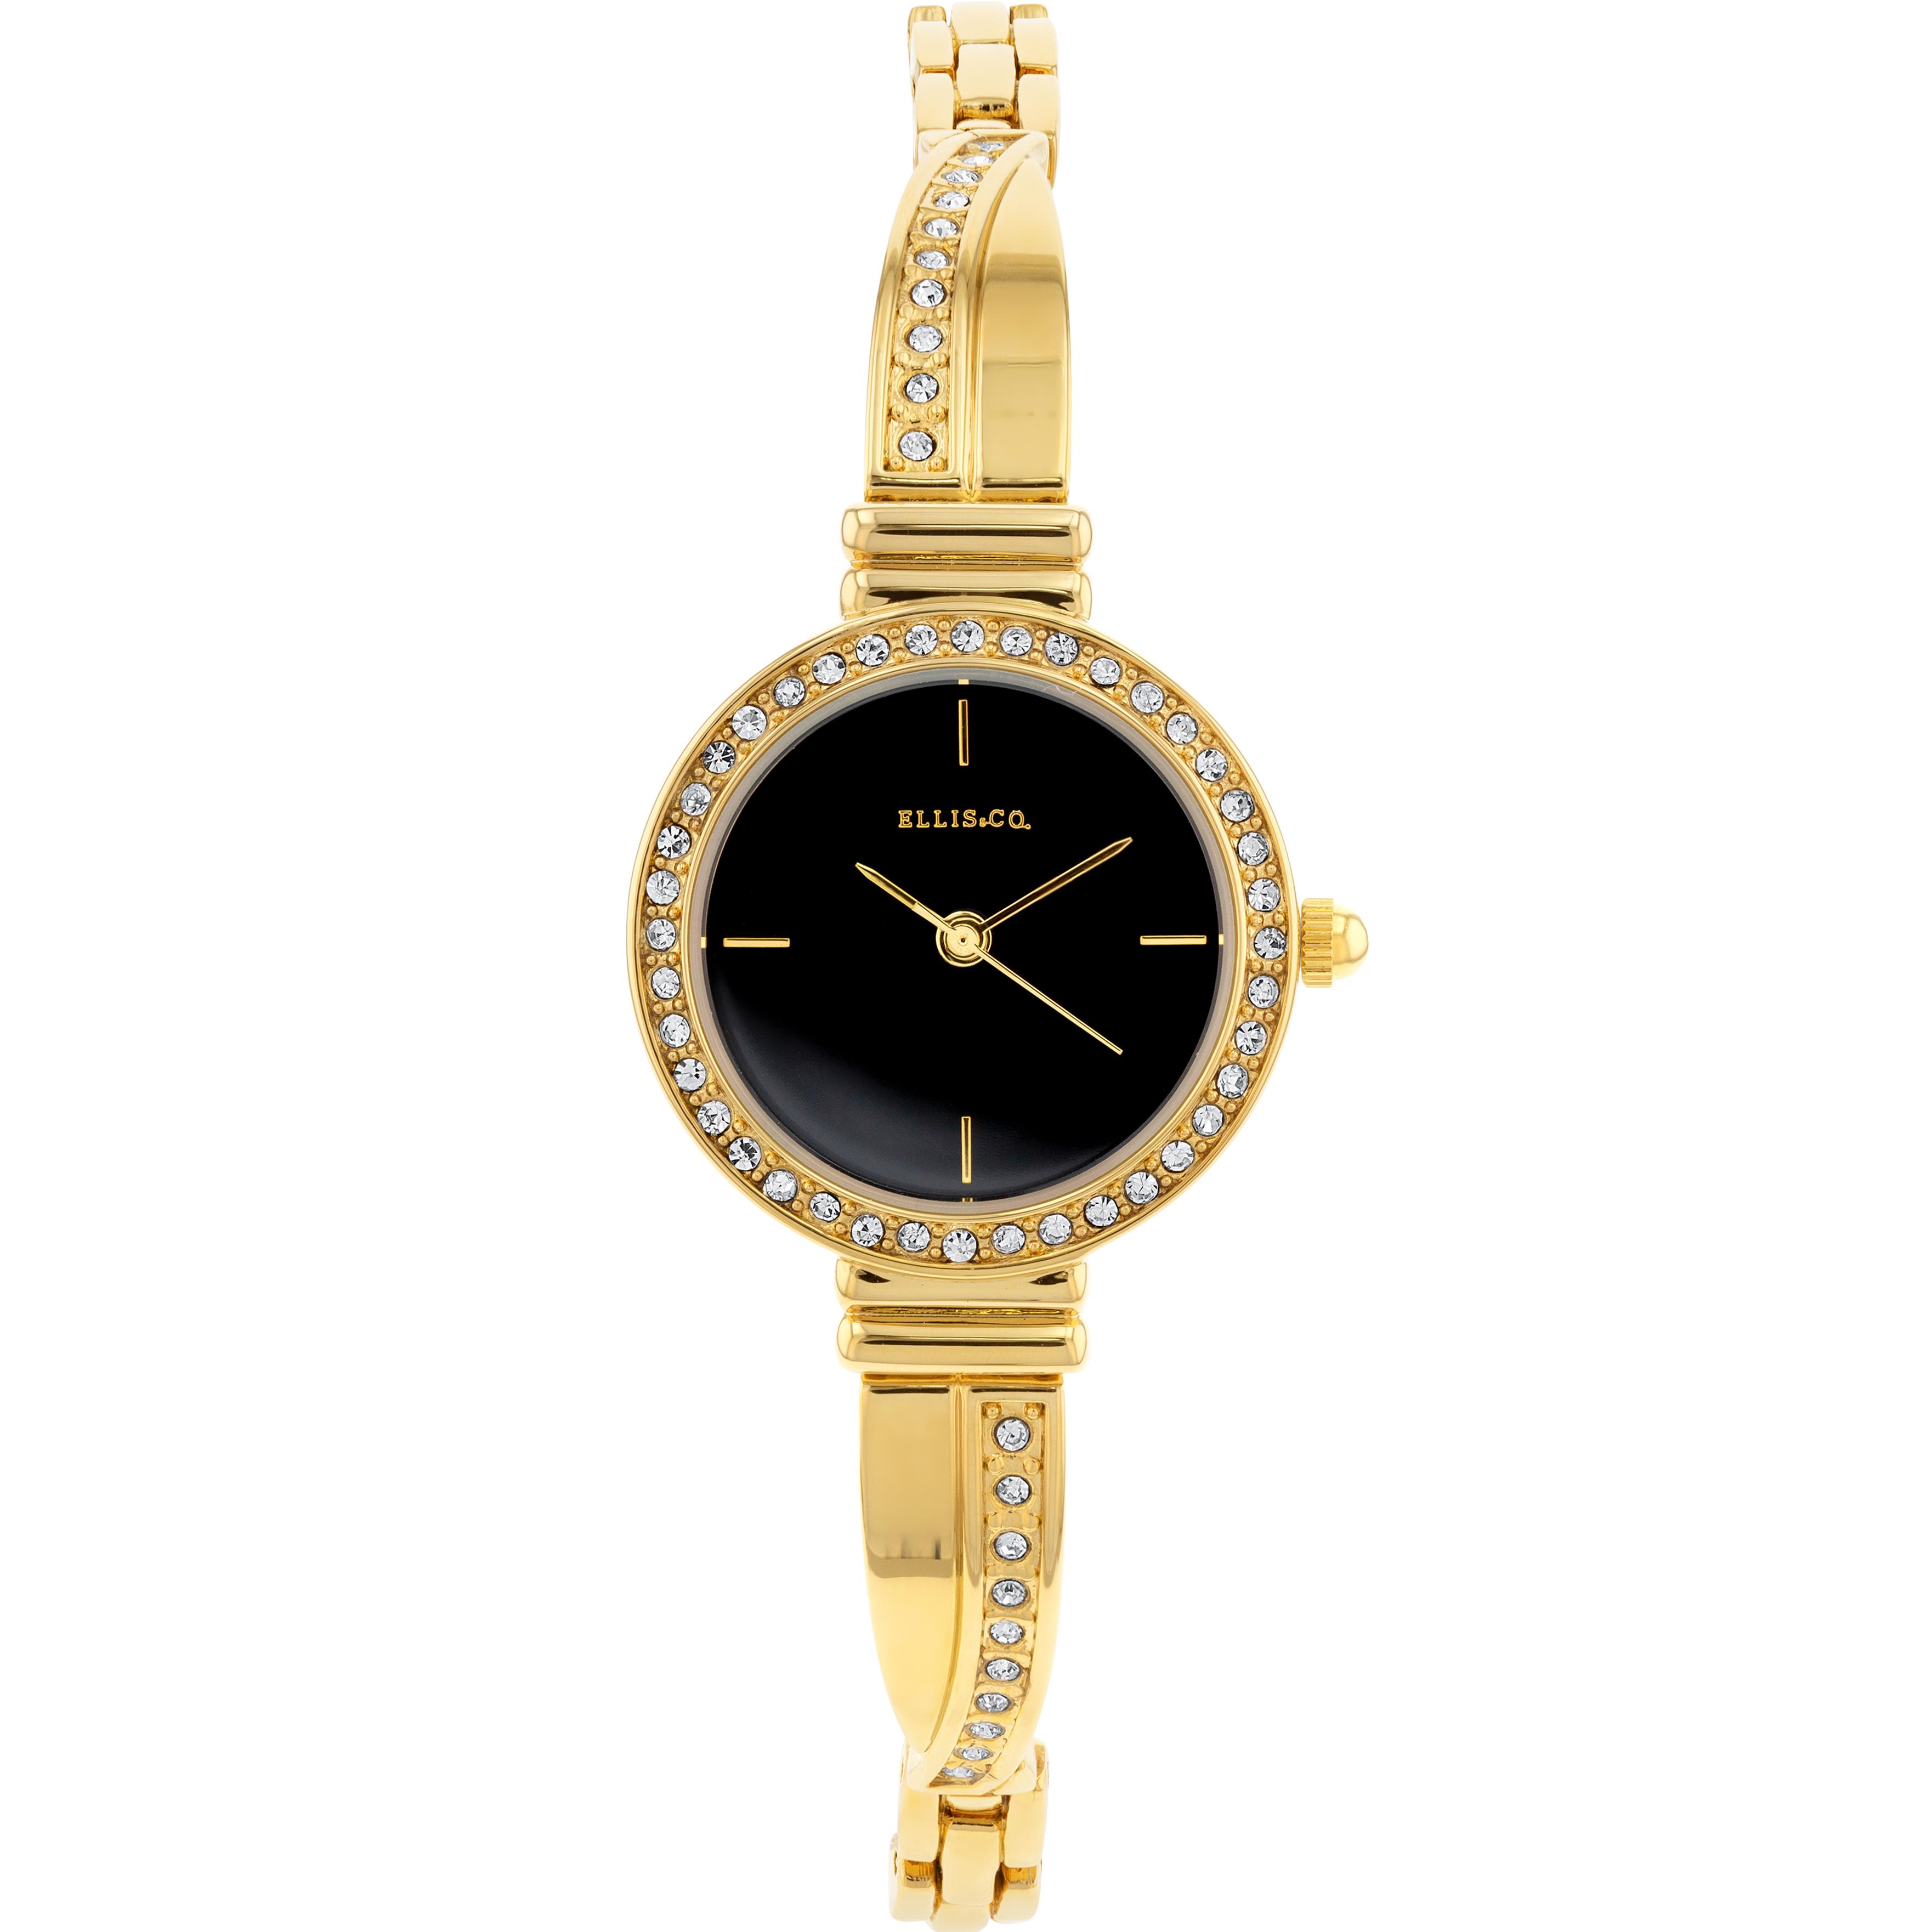 Ellis & Co ' Erika' Gold Plated Women's Watch